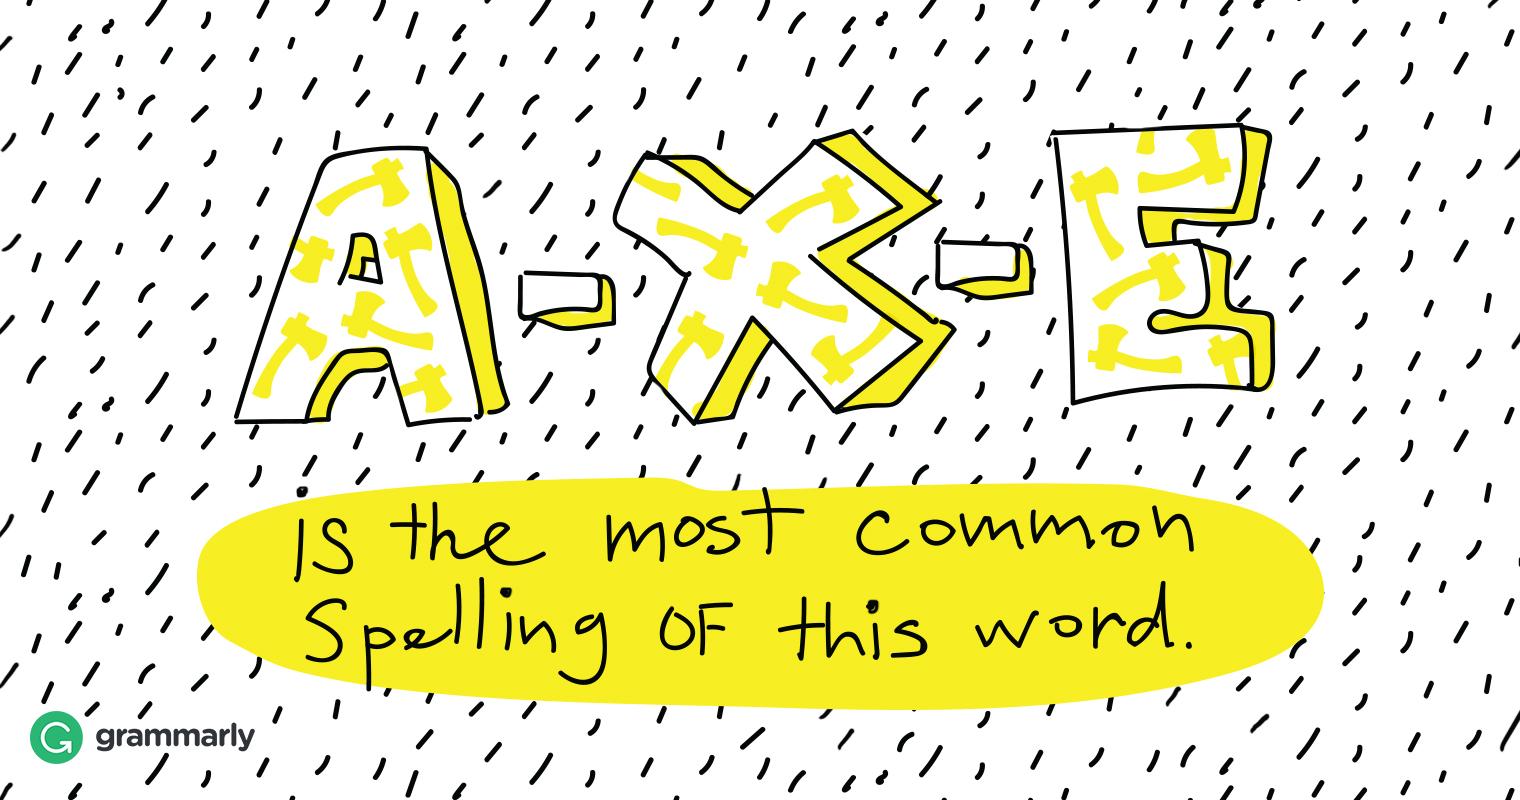 Ax vs. Axe image